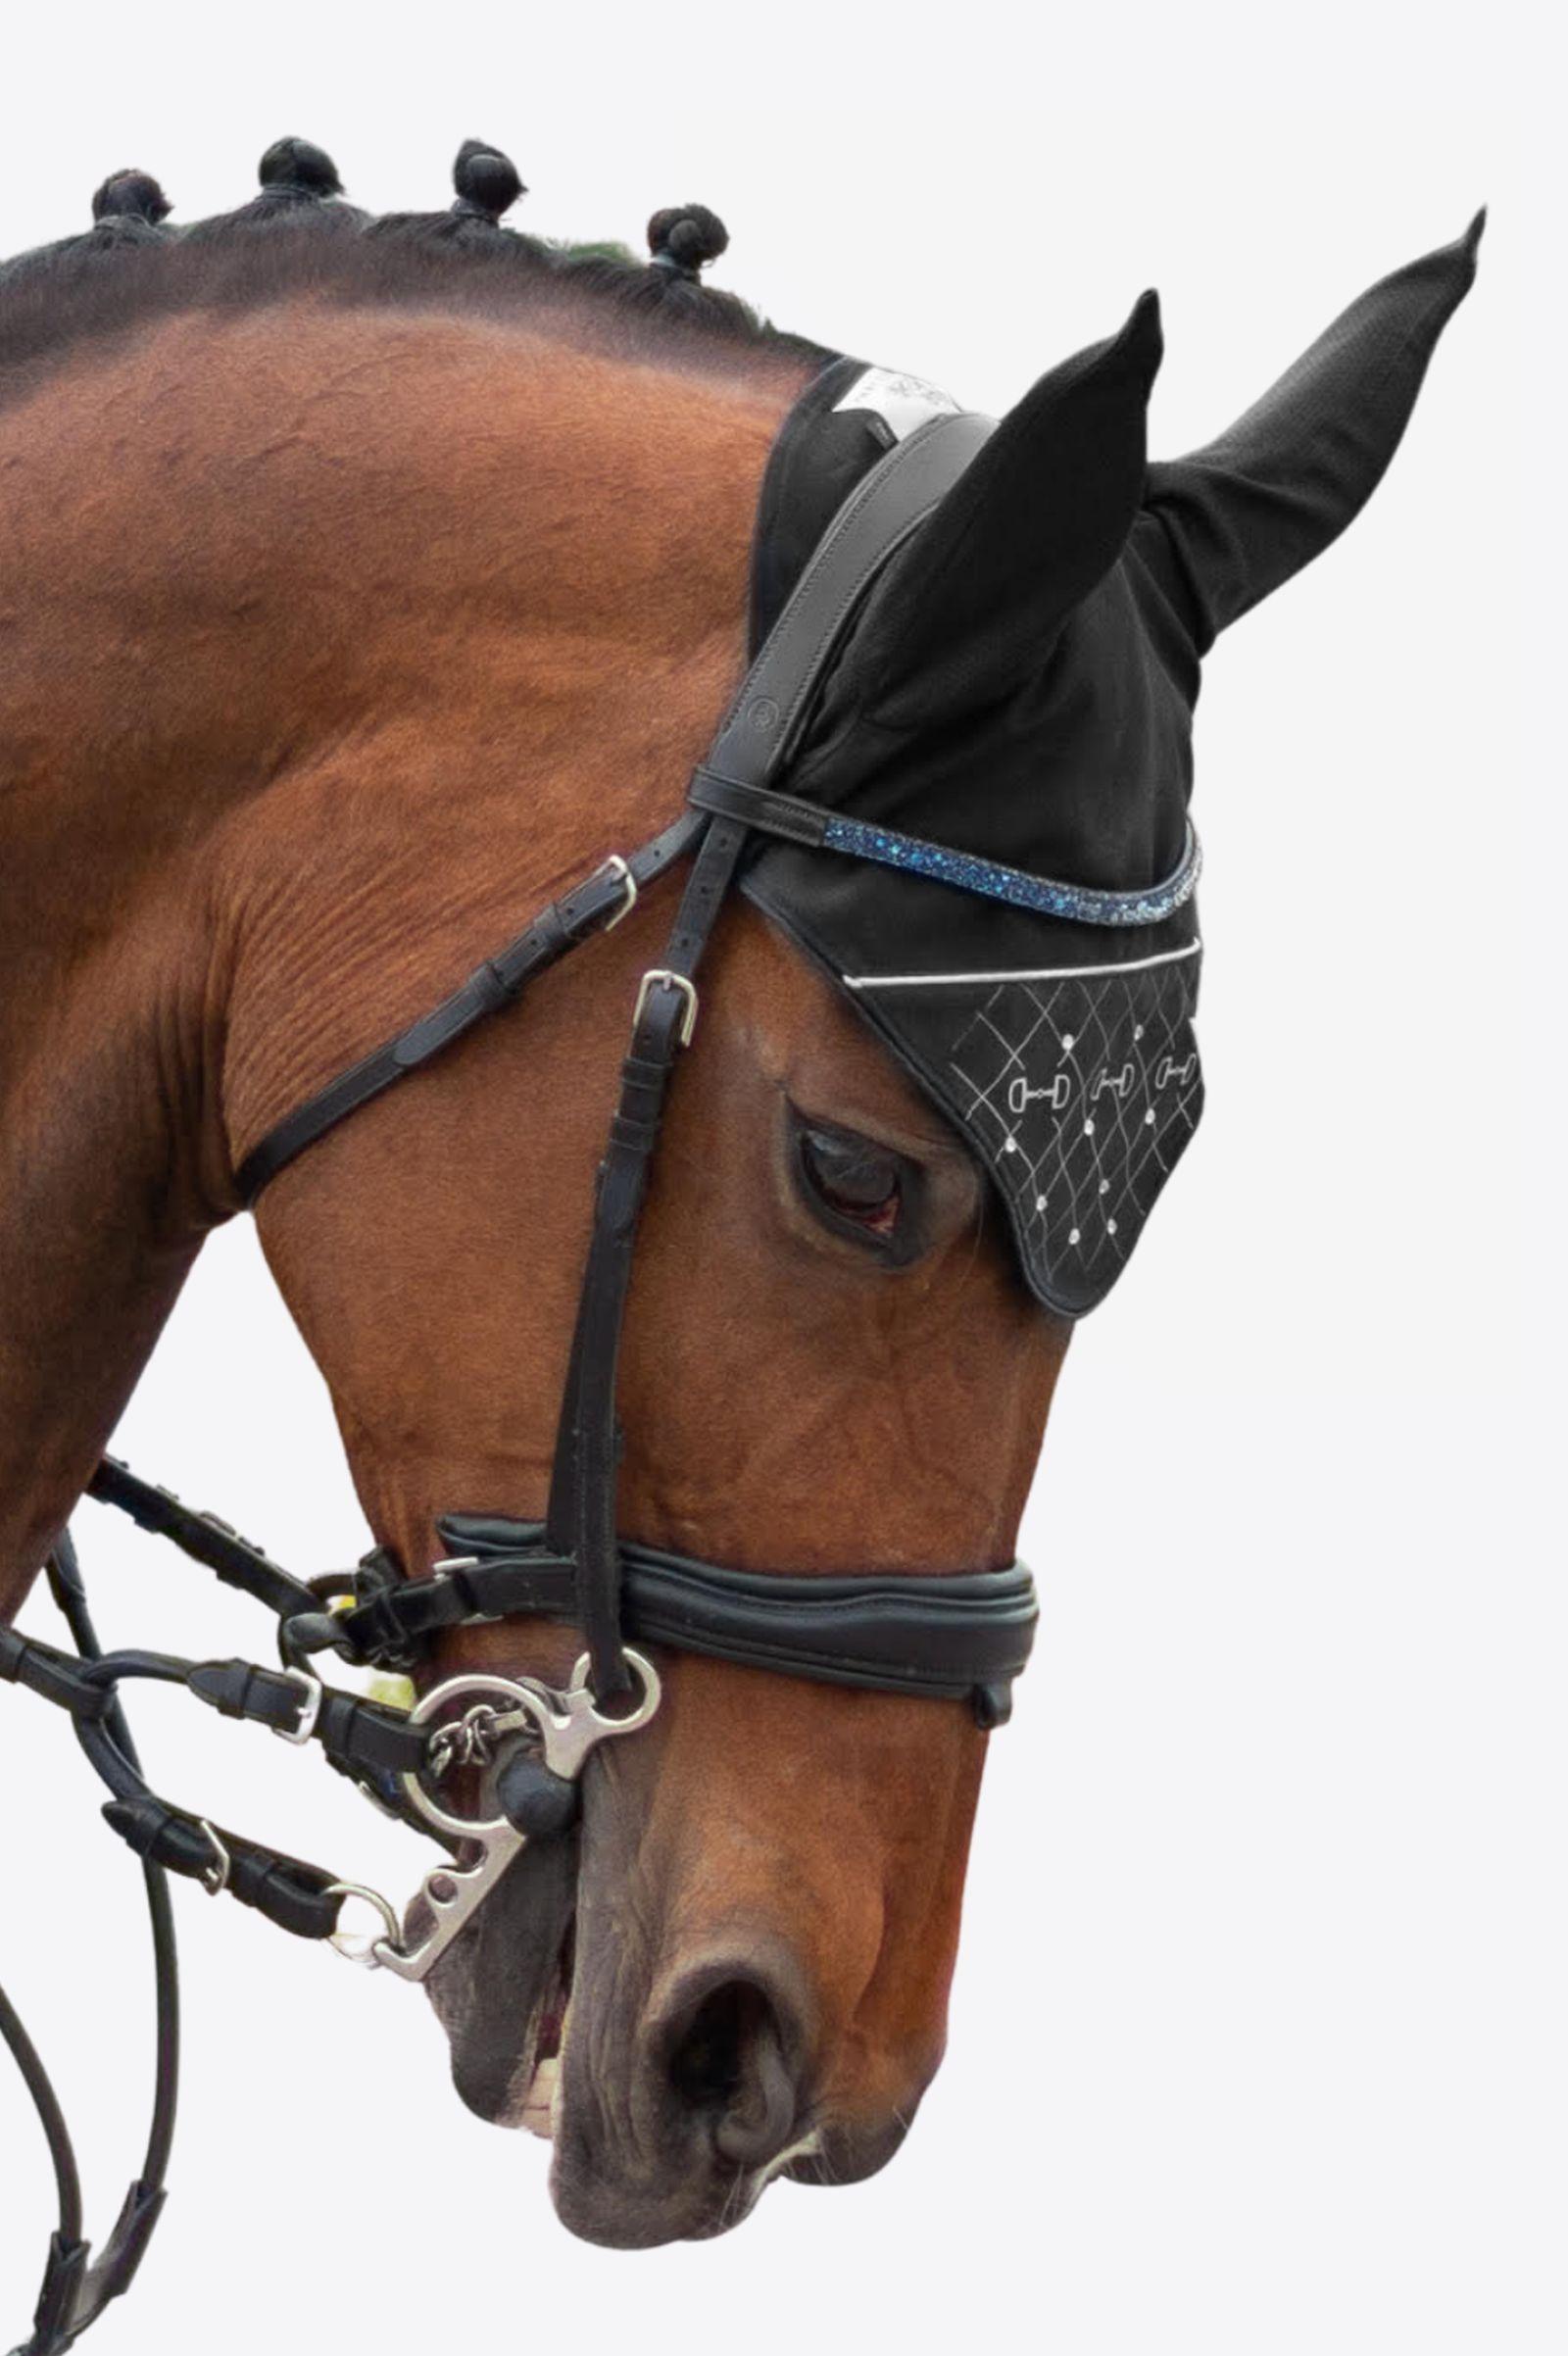 FLY VEIL HORSE EAR NET CROCHET EQUESTRIAN /& CRYSTAL PURPLE COLOR FULL//COB//PONY